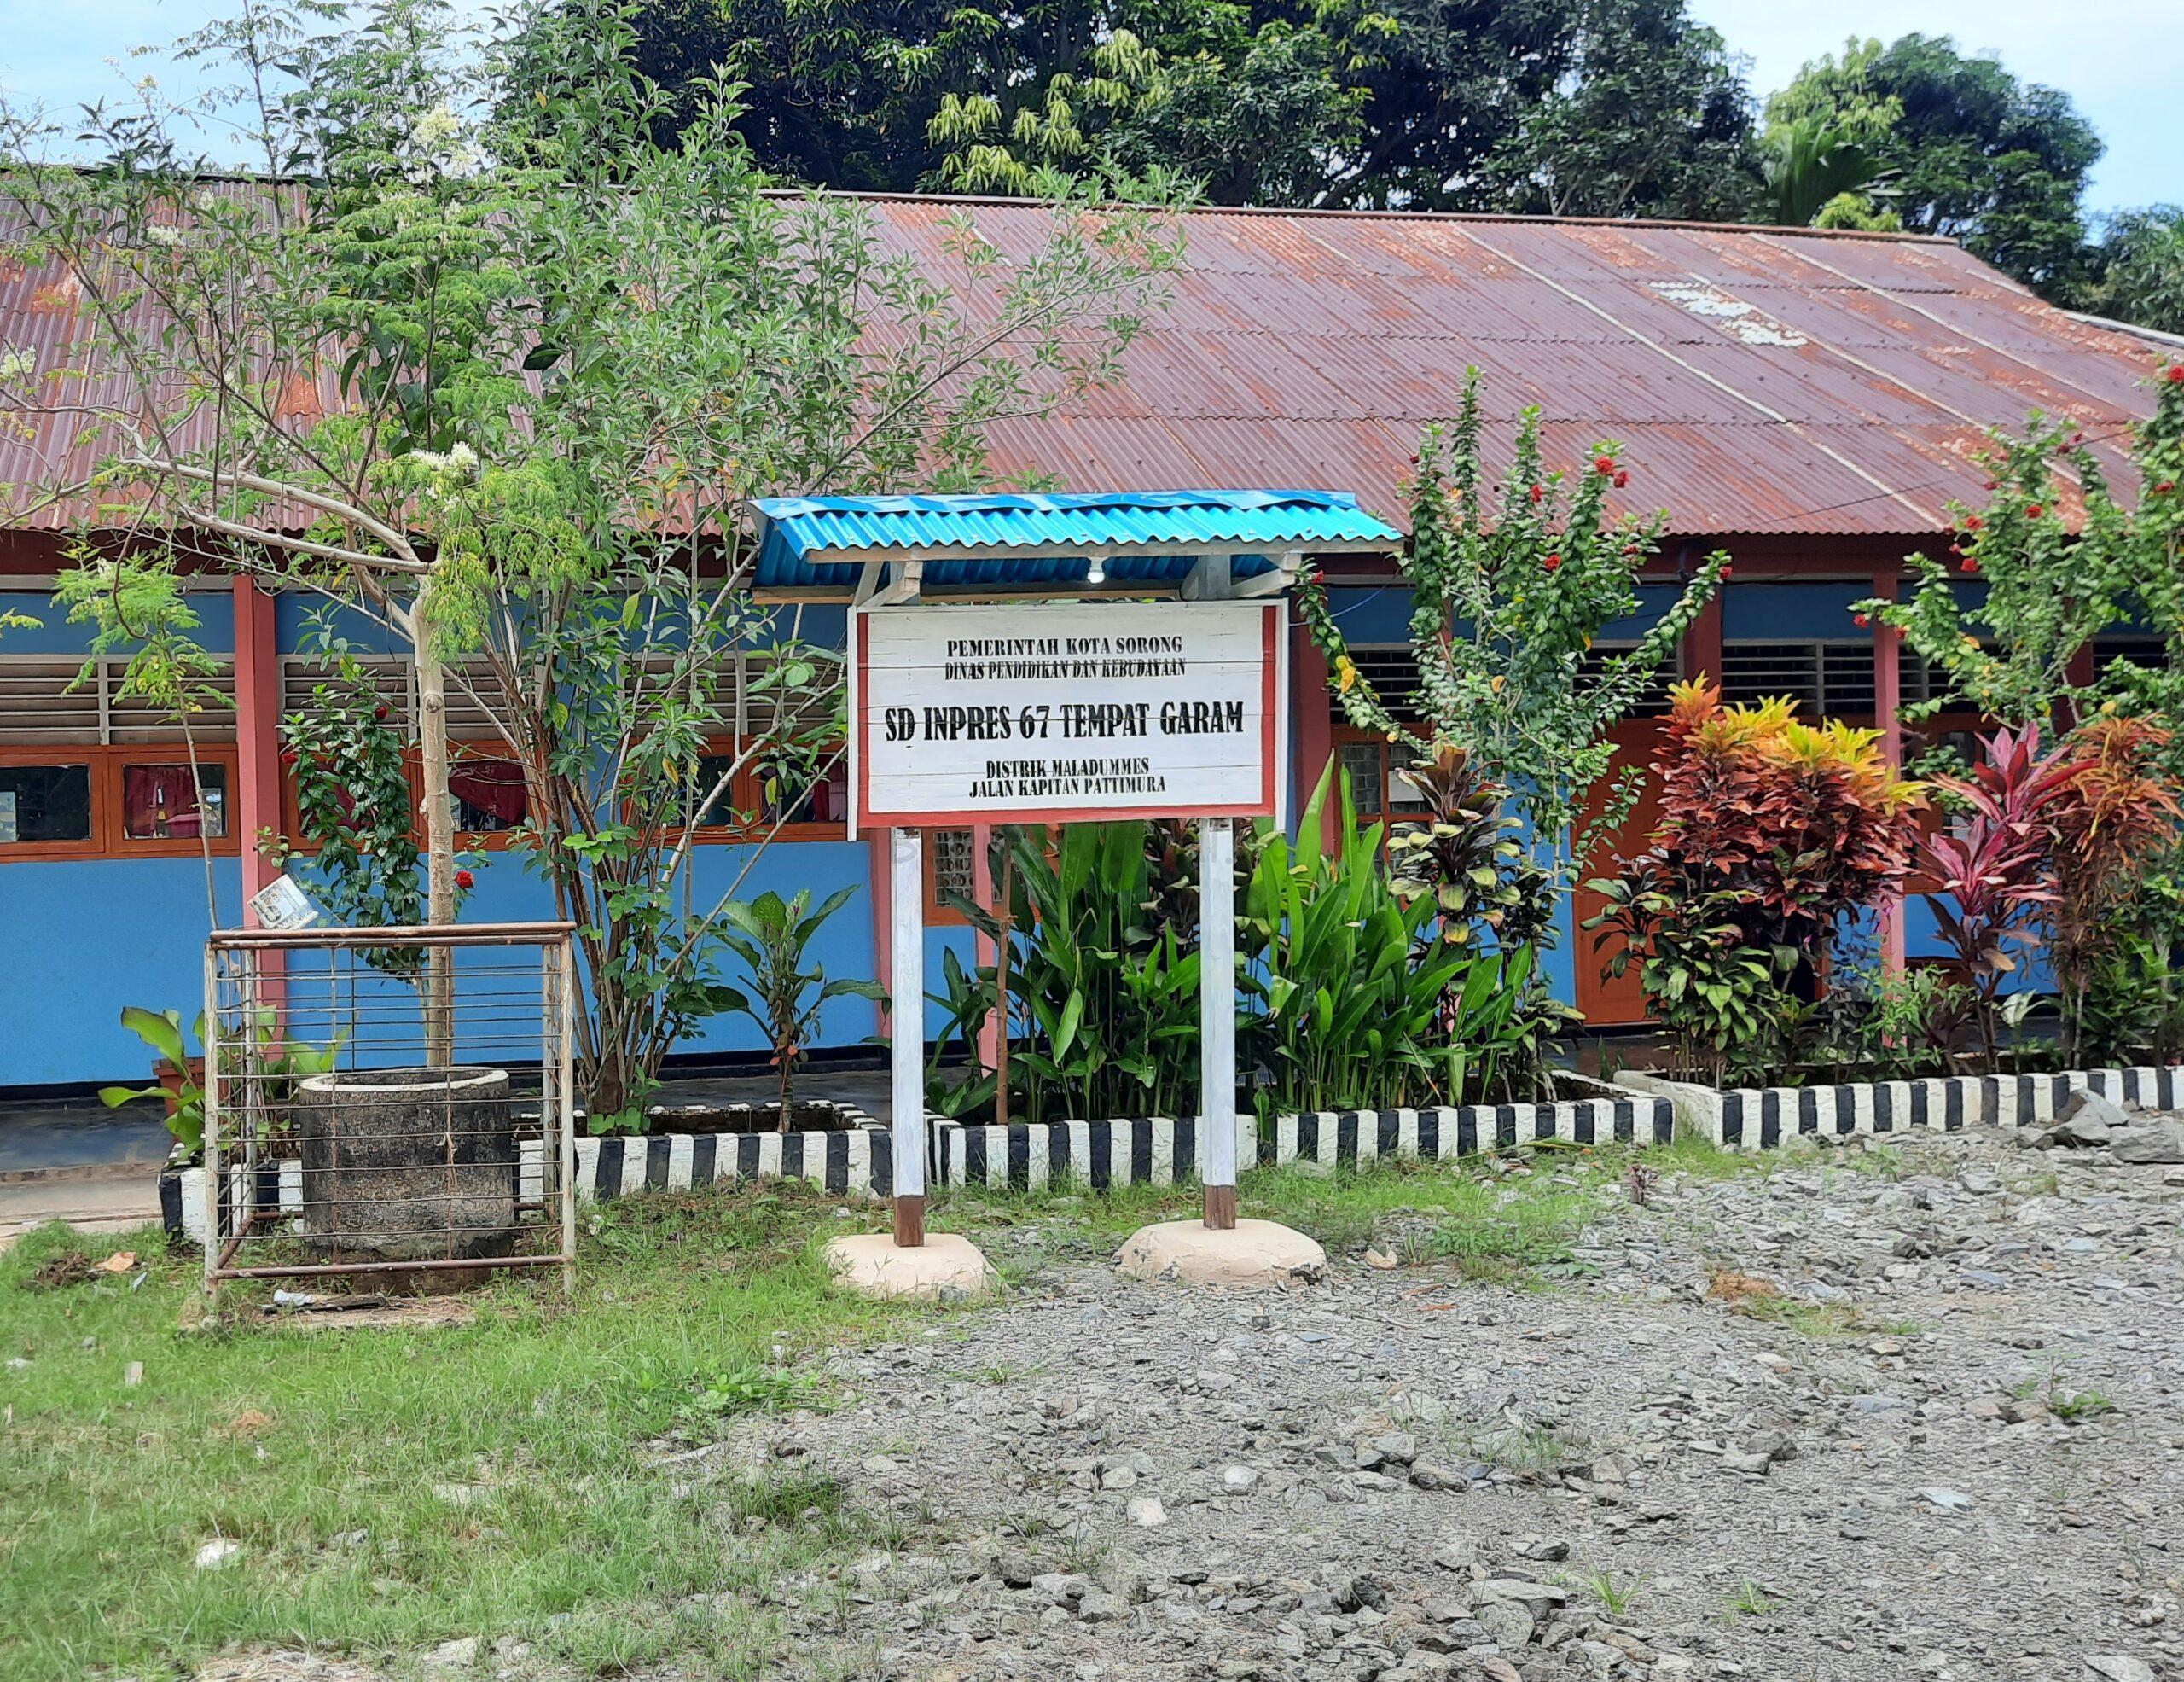 3 Sekolah di Kota Sorong Dapat Bantuan Puluhan Alat TIK Melalui Usulan Rico Sia 1 20201021 213452 scaled